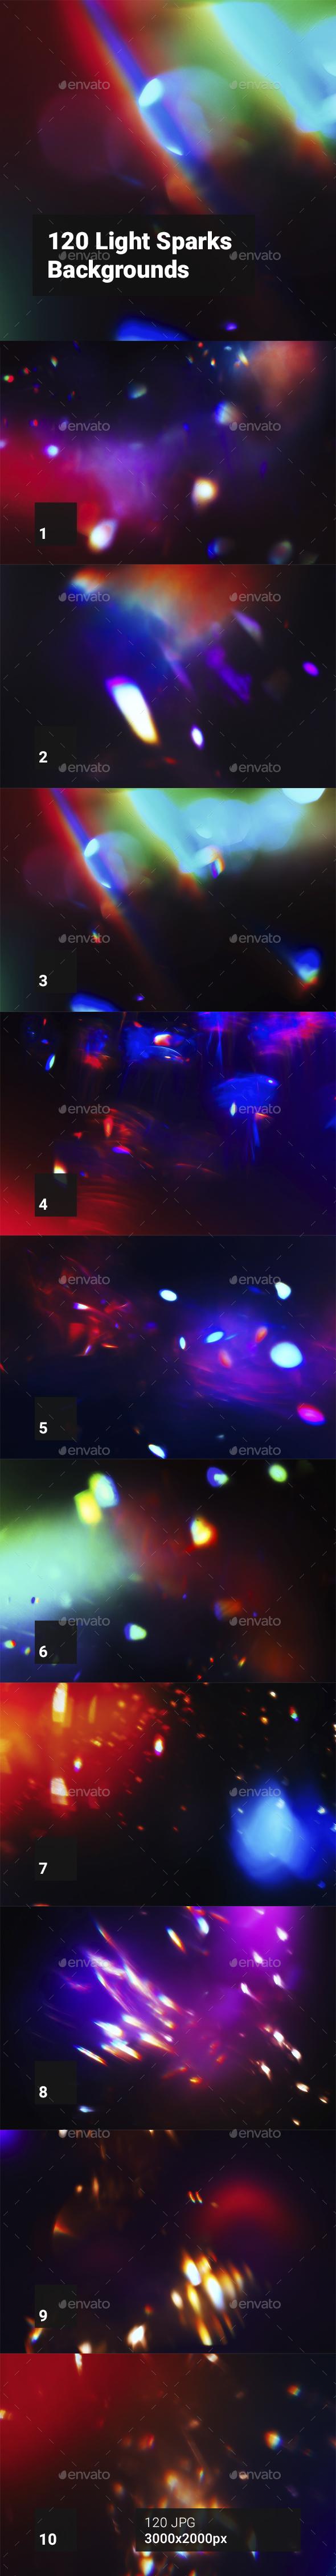 GraphicRiver 120 Light Sparks Backgrounds 20448993